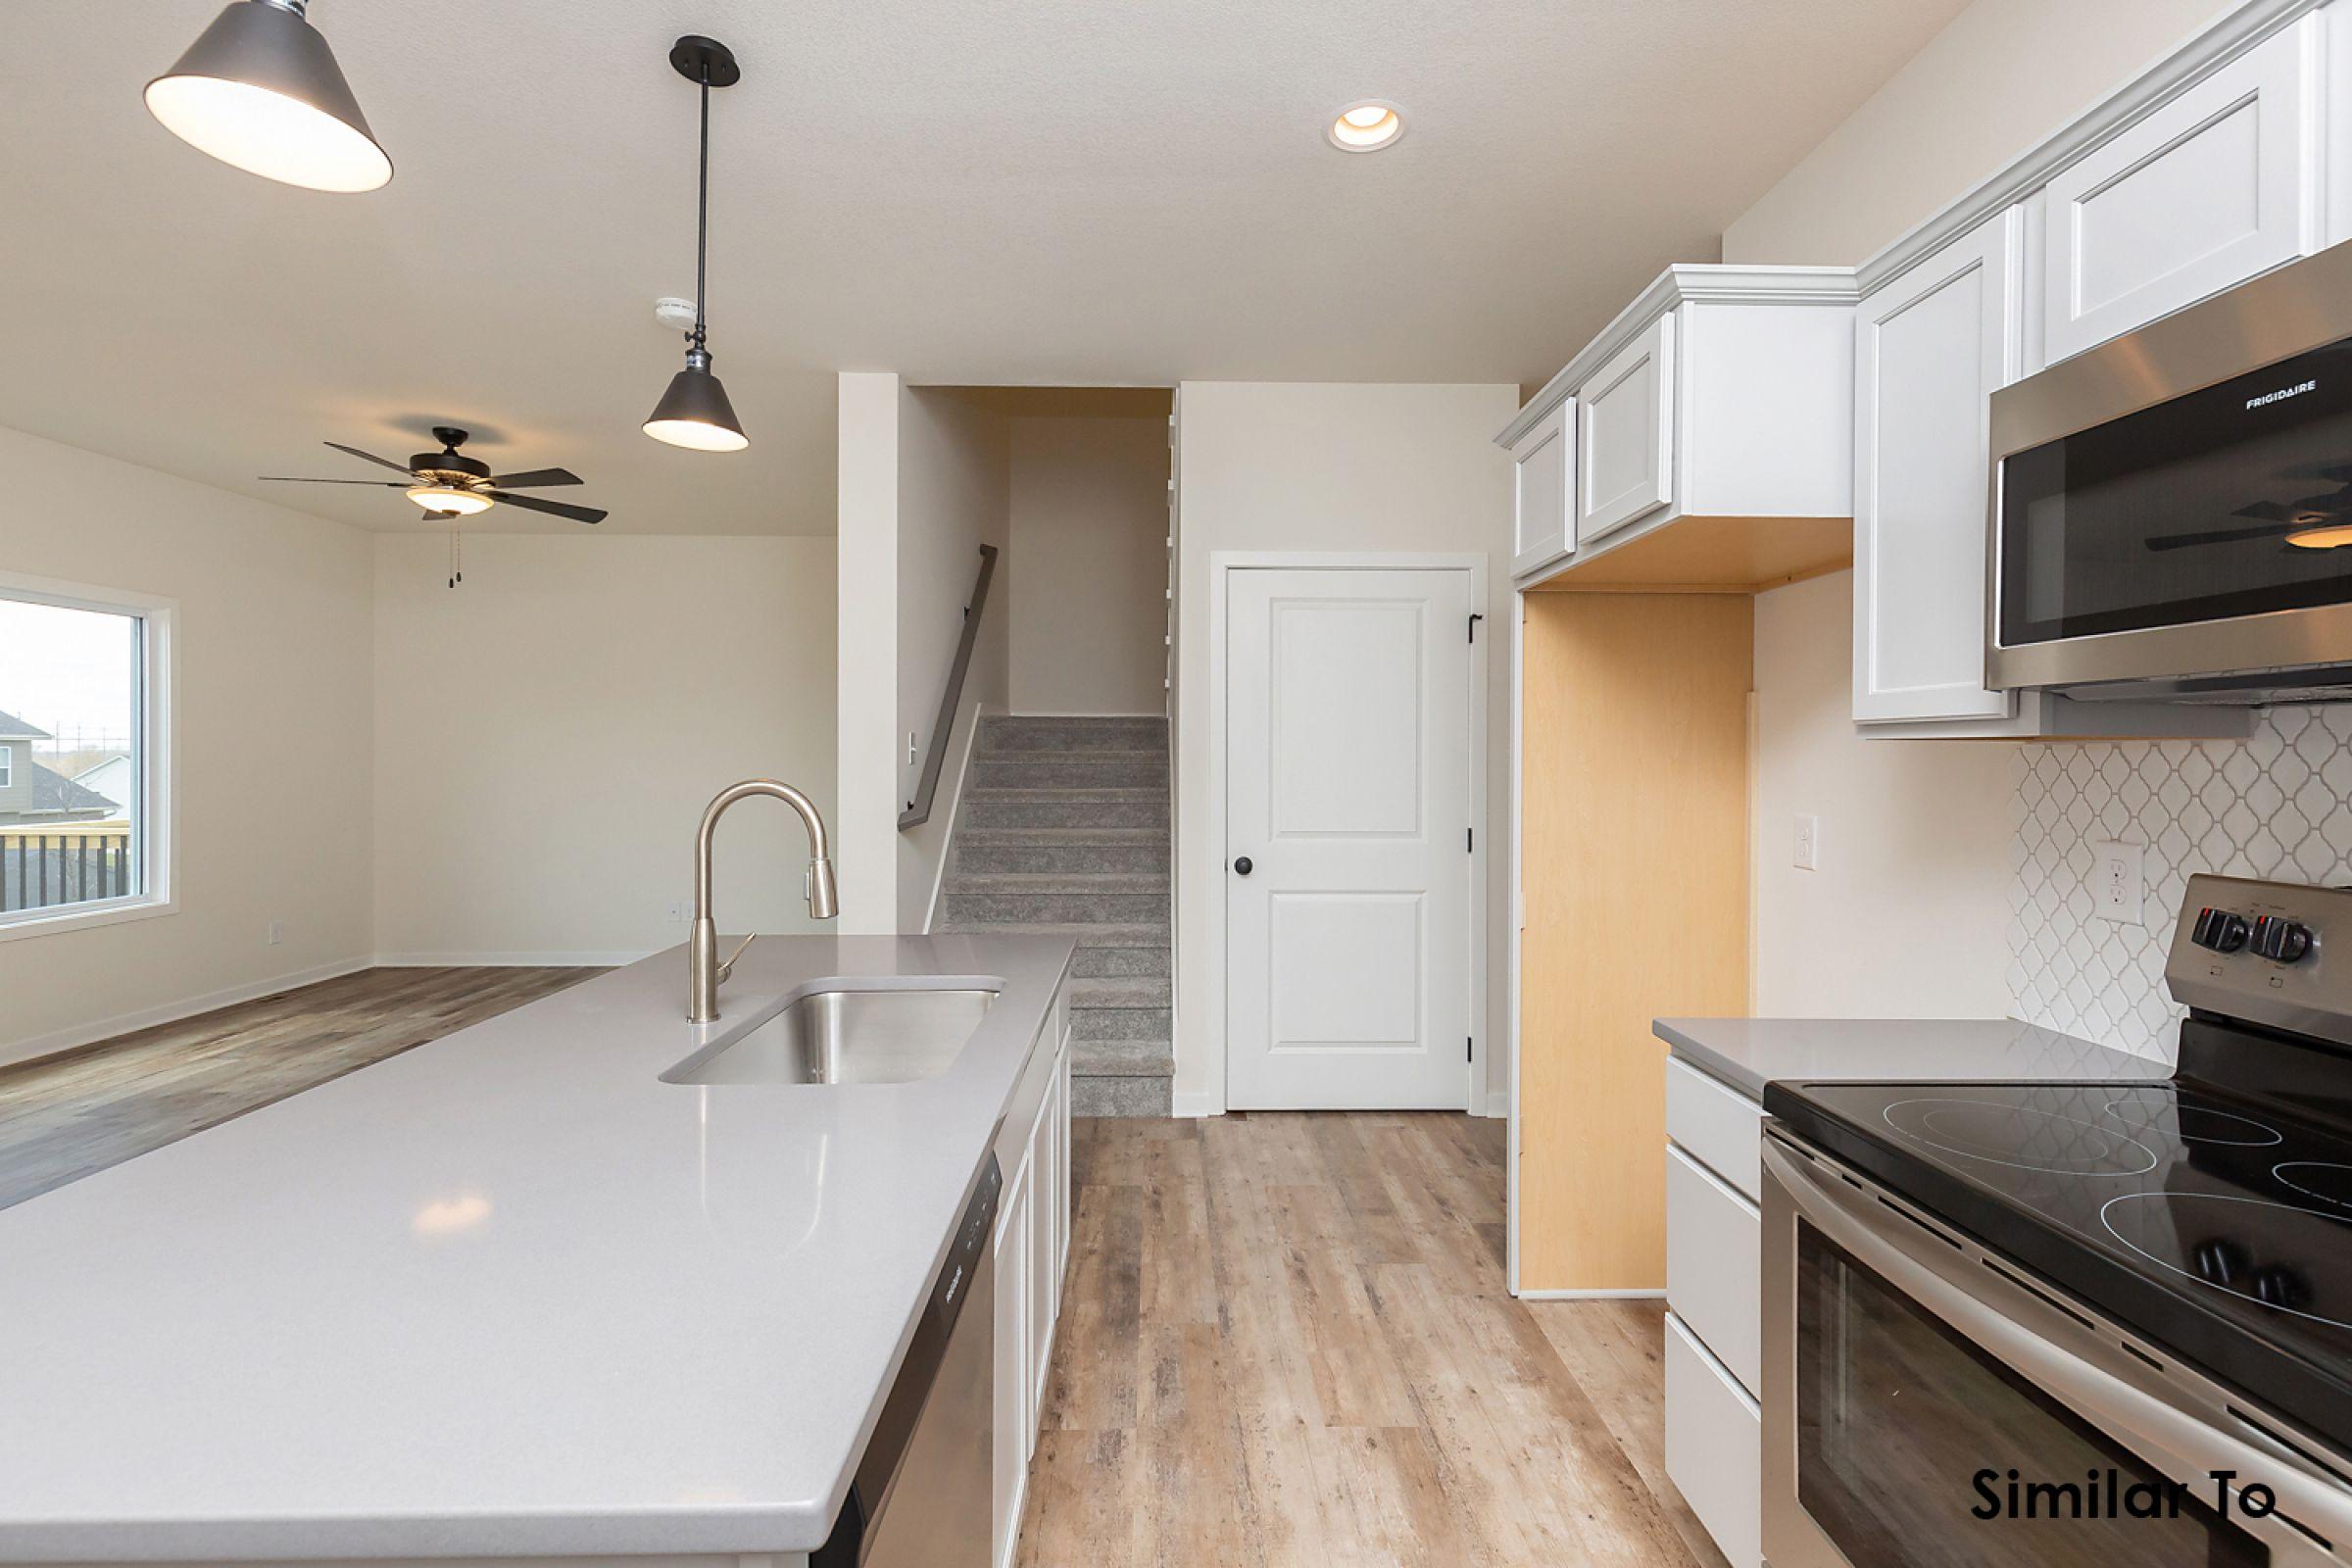 residential-warren-county-iowa-0-acres-listing-number-15138-5-2020-08-28-172753.jpg